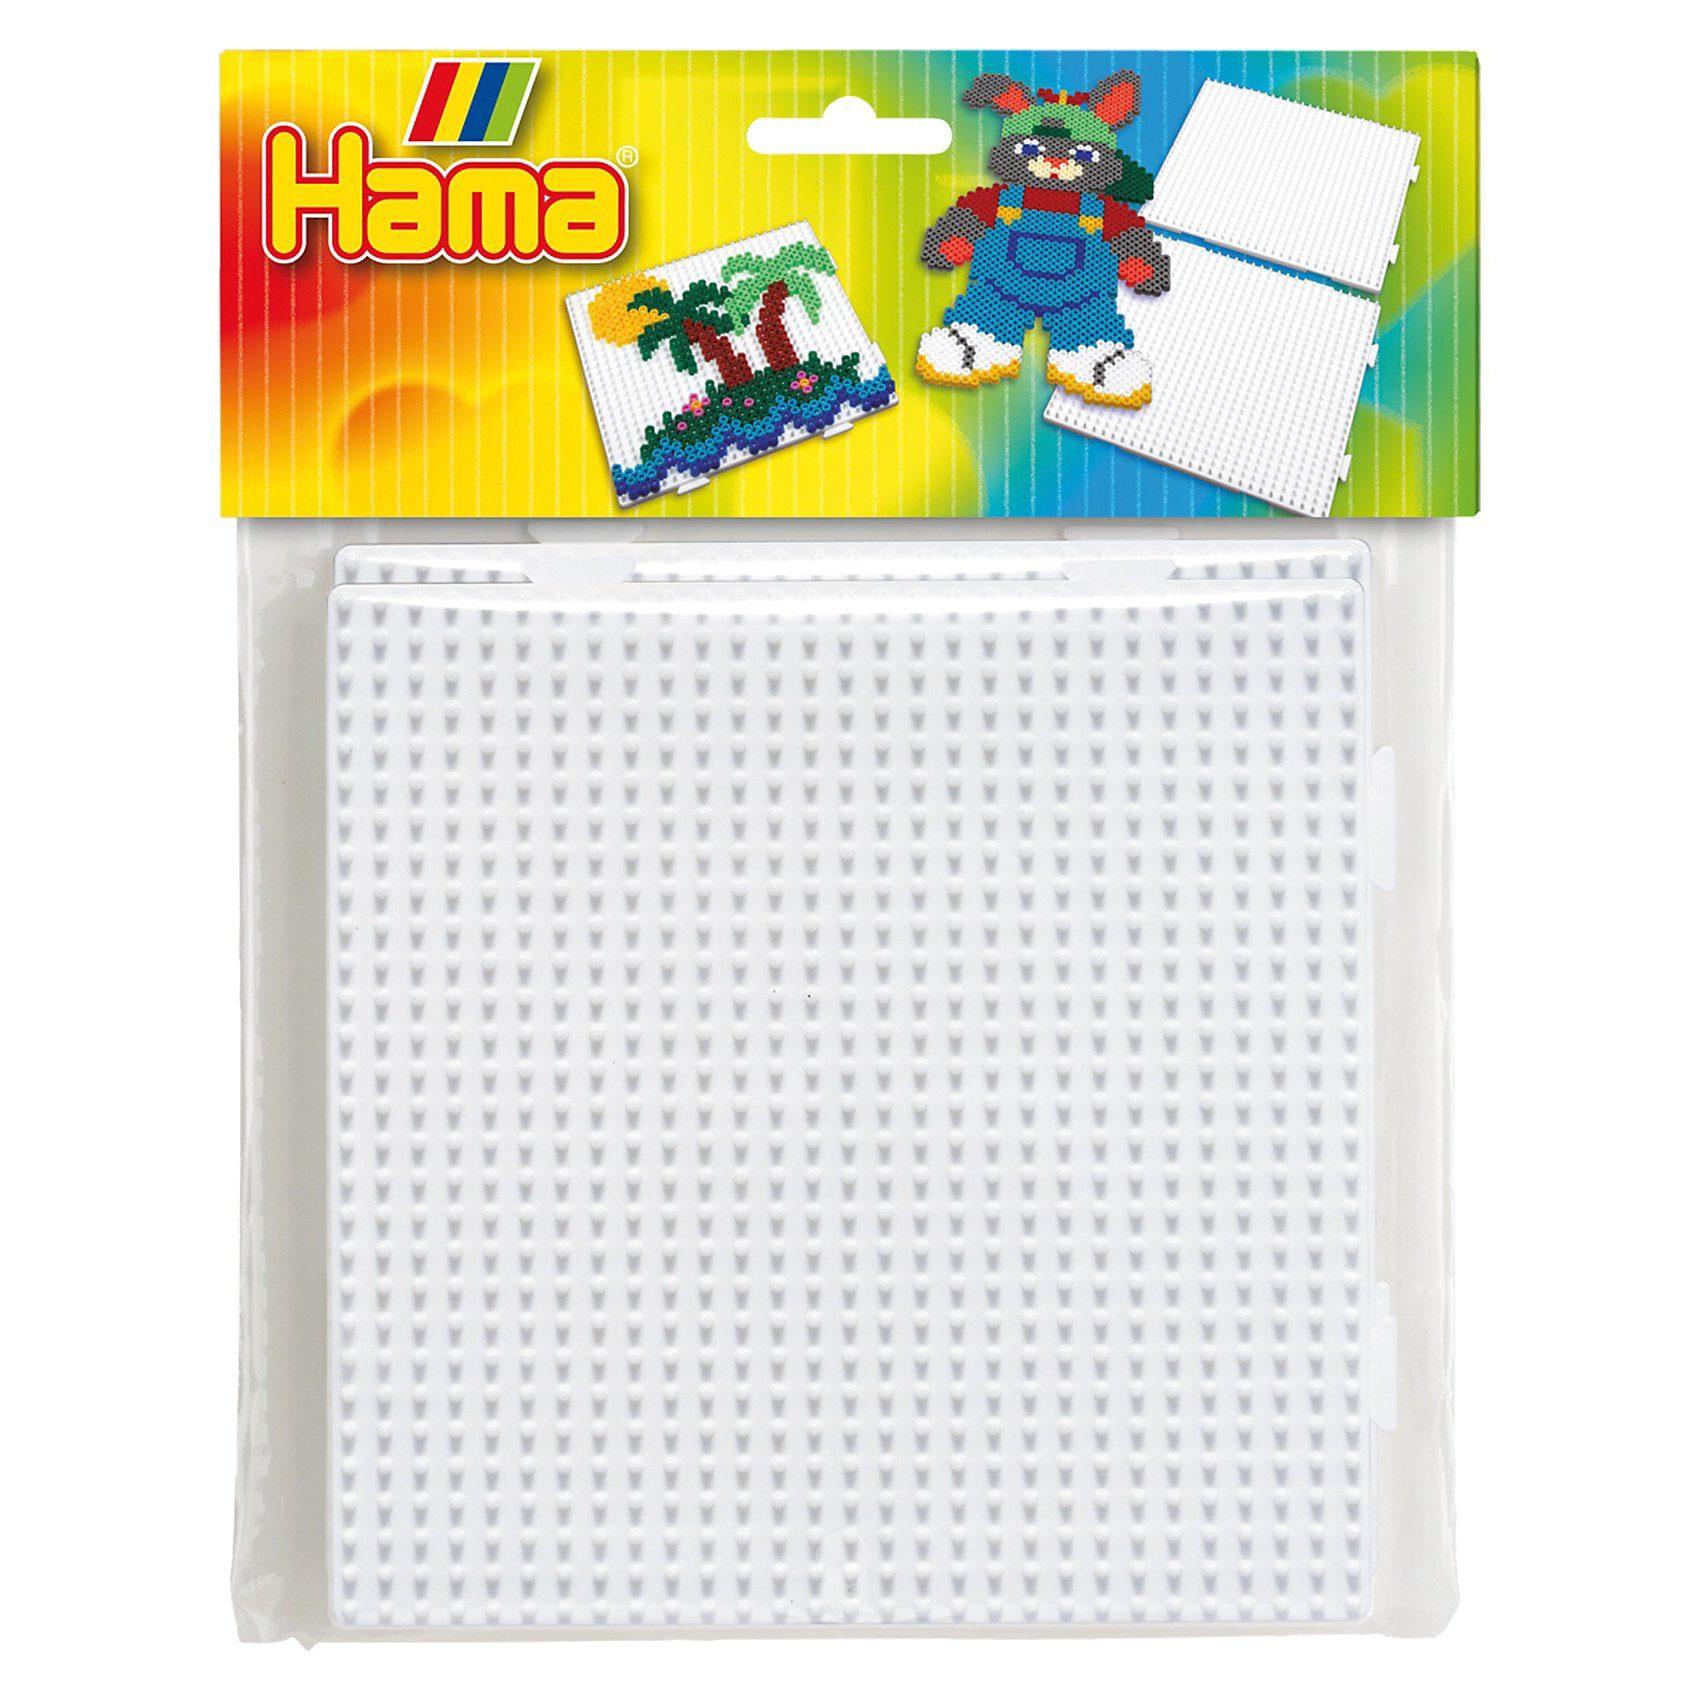 Hama Perlen HAMA 4458 midi Stiftplatten-Set 2 große Quadrat, zusammenste